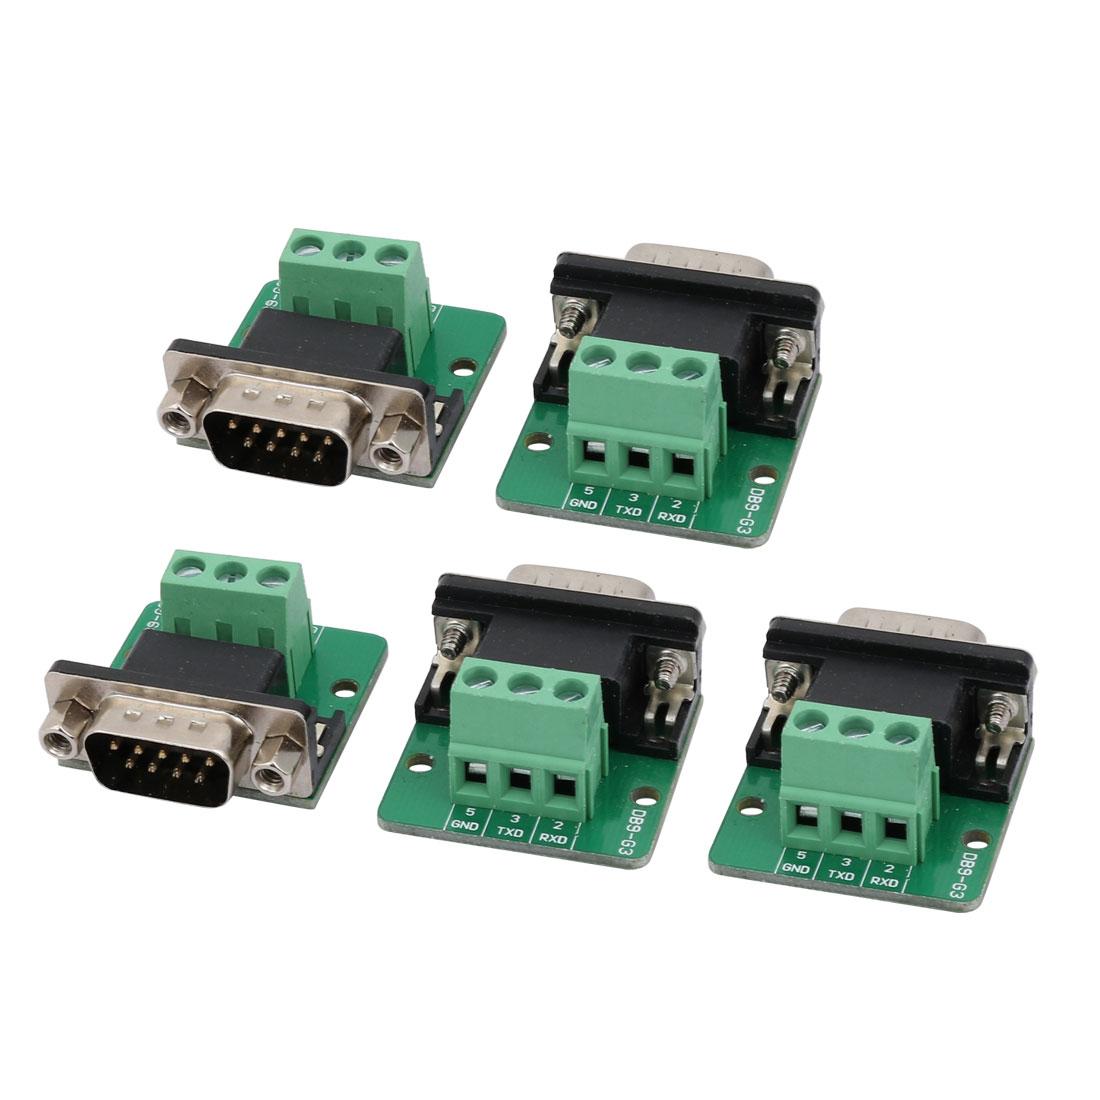 5 Pcs DB9-G3 Male Adapter Plate 9P Terminal Breakout Board Signal Module